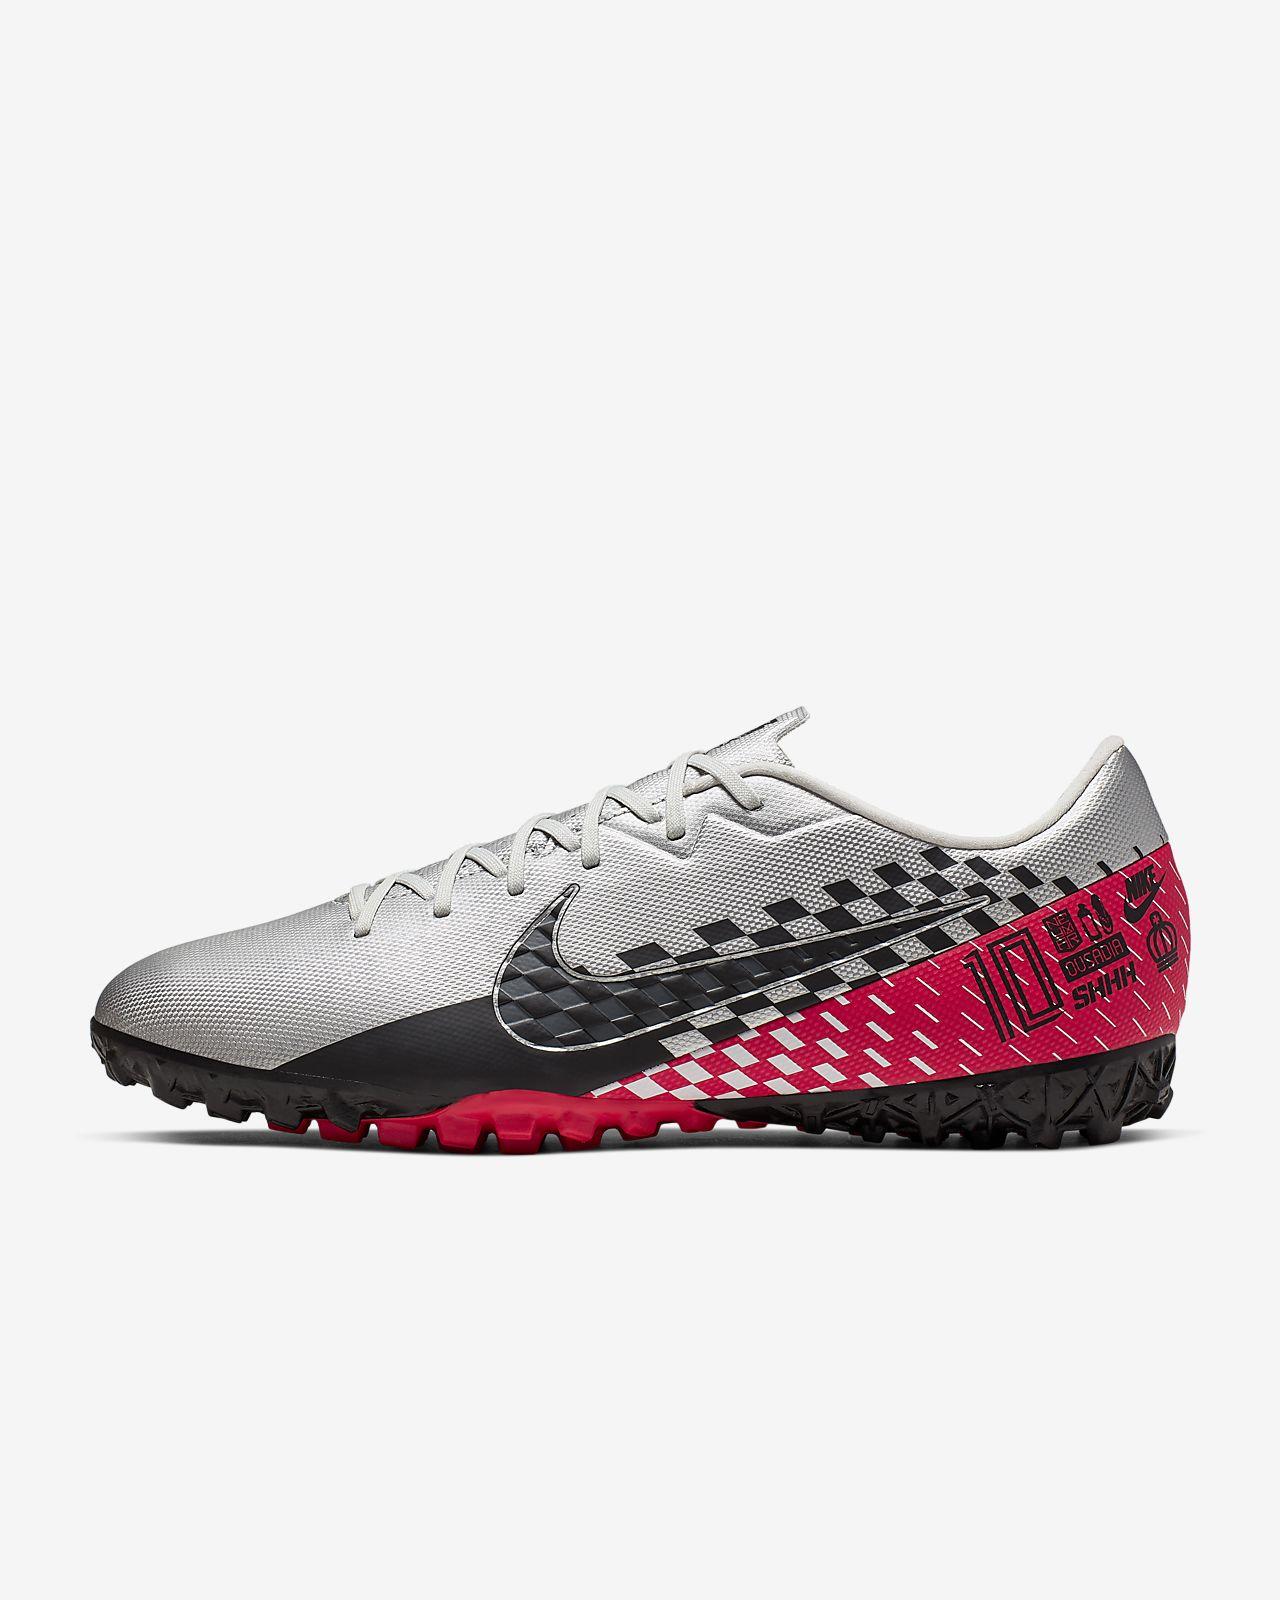 Nike Mercurial Vapor 13 Academy Neymar Jr. TF Artificial Turf Football Shoe